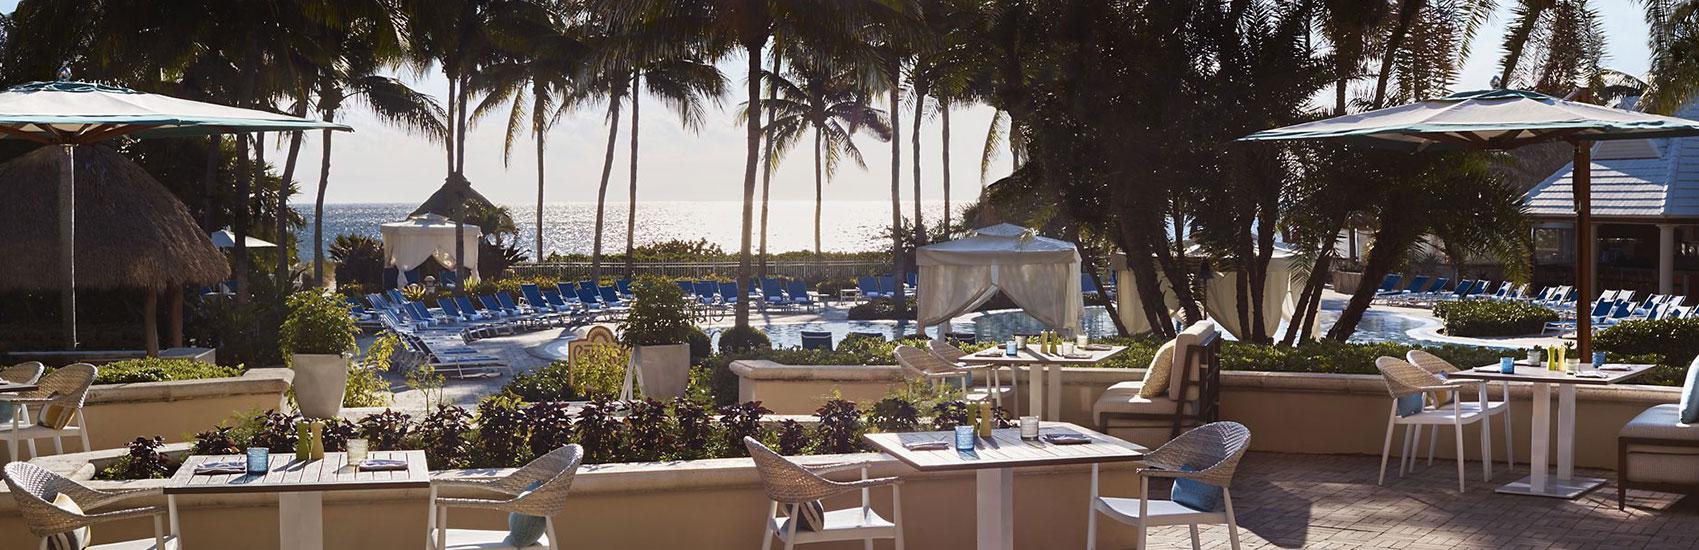 The Ritz Carlton, Key Biscayne